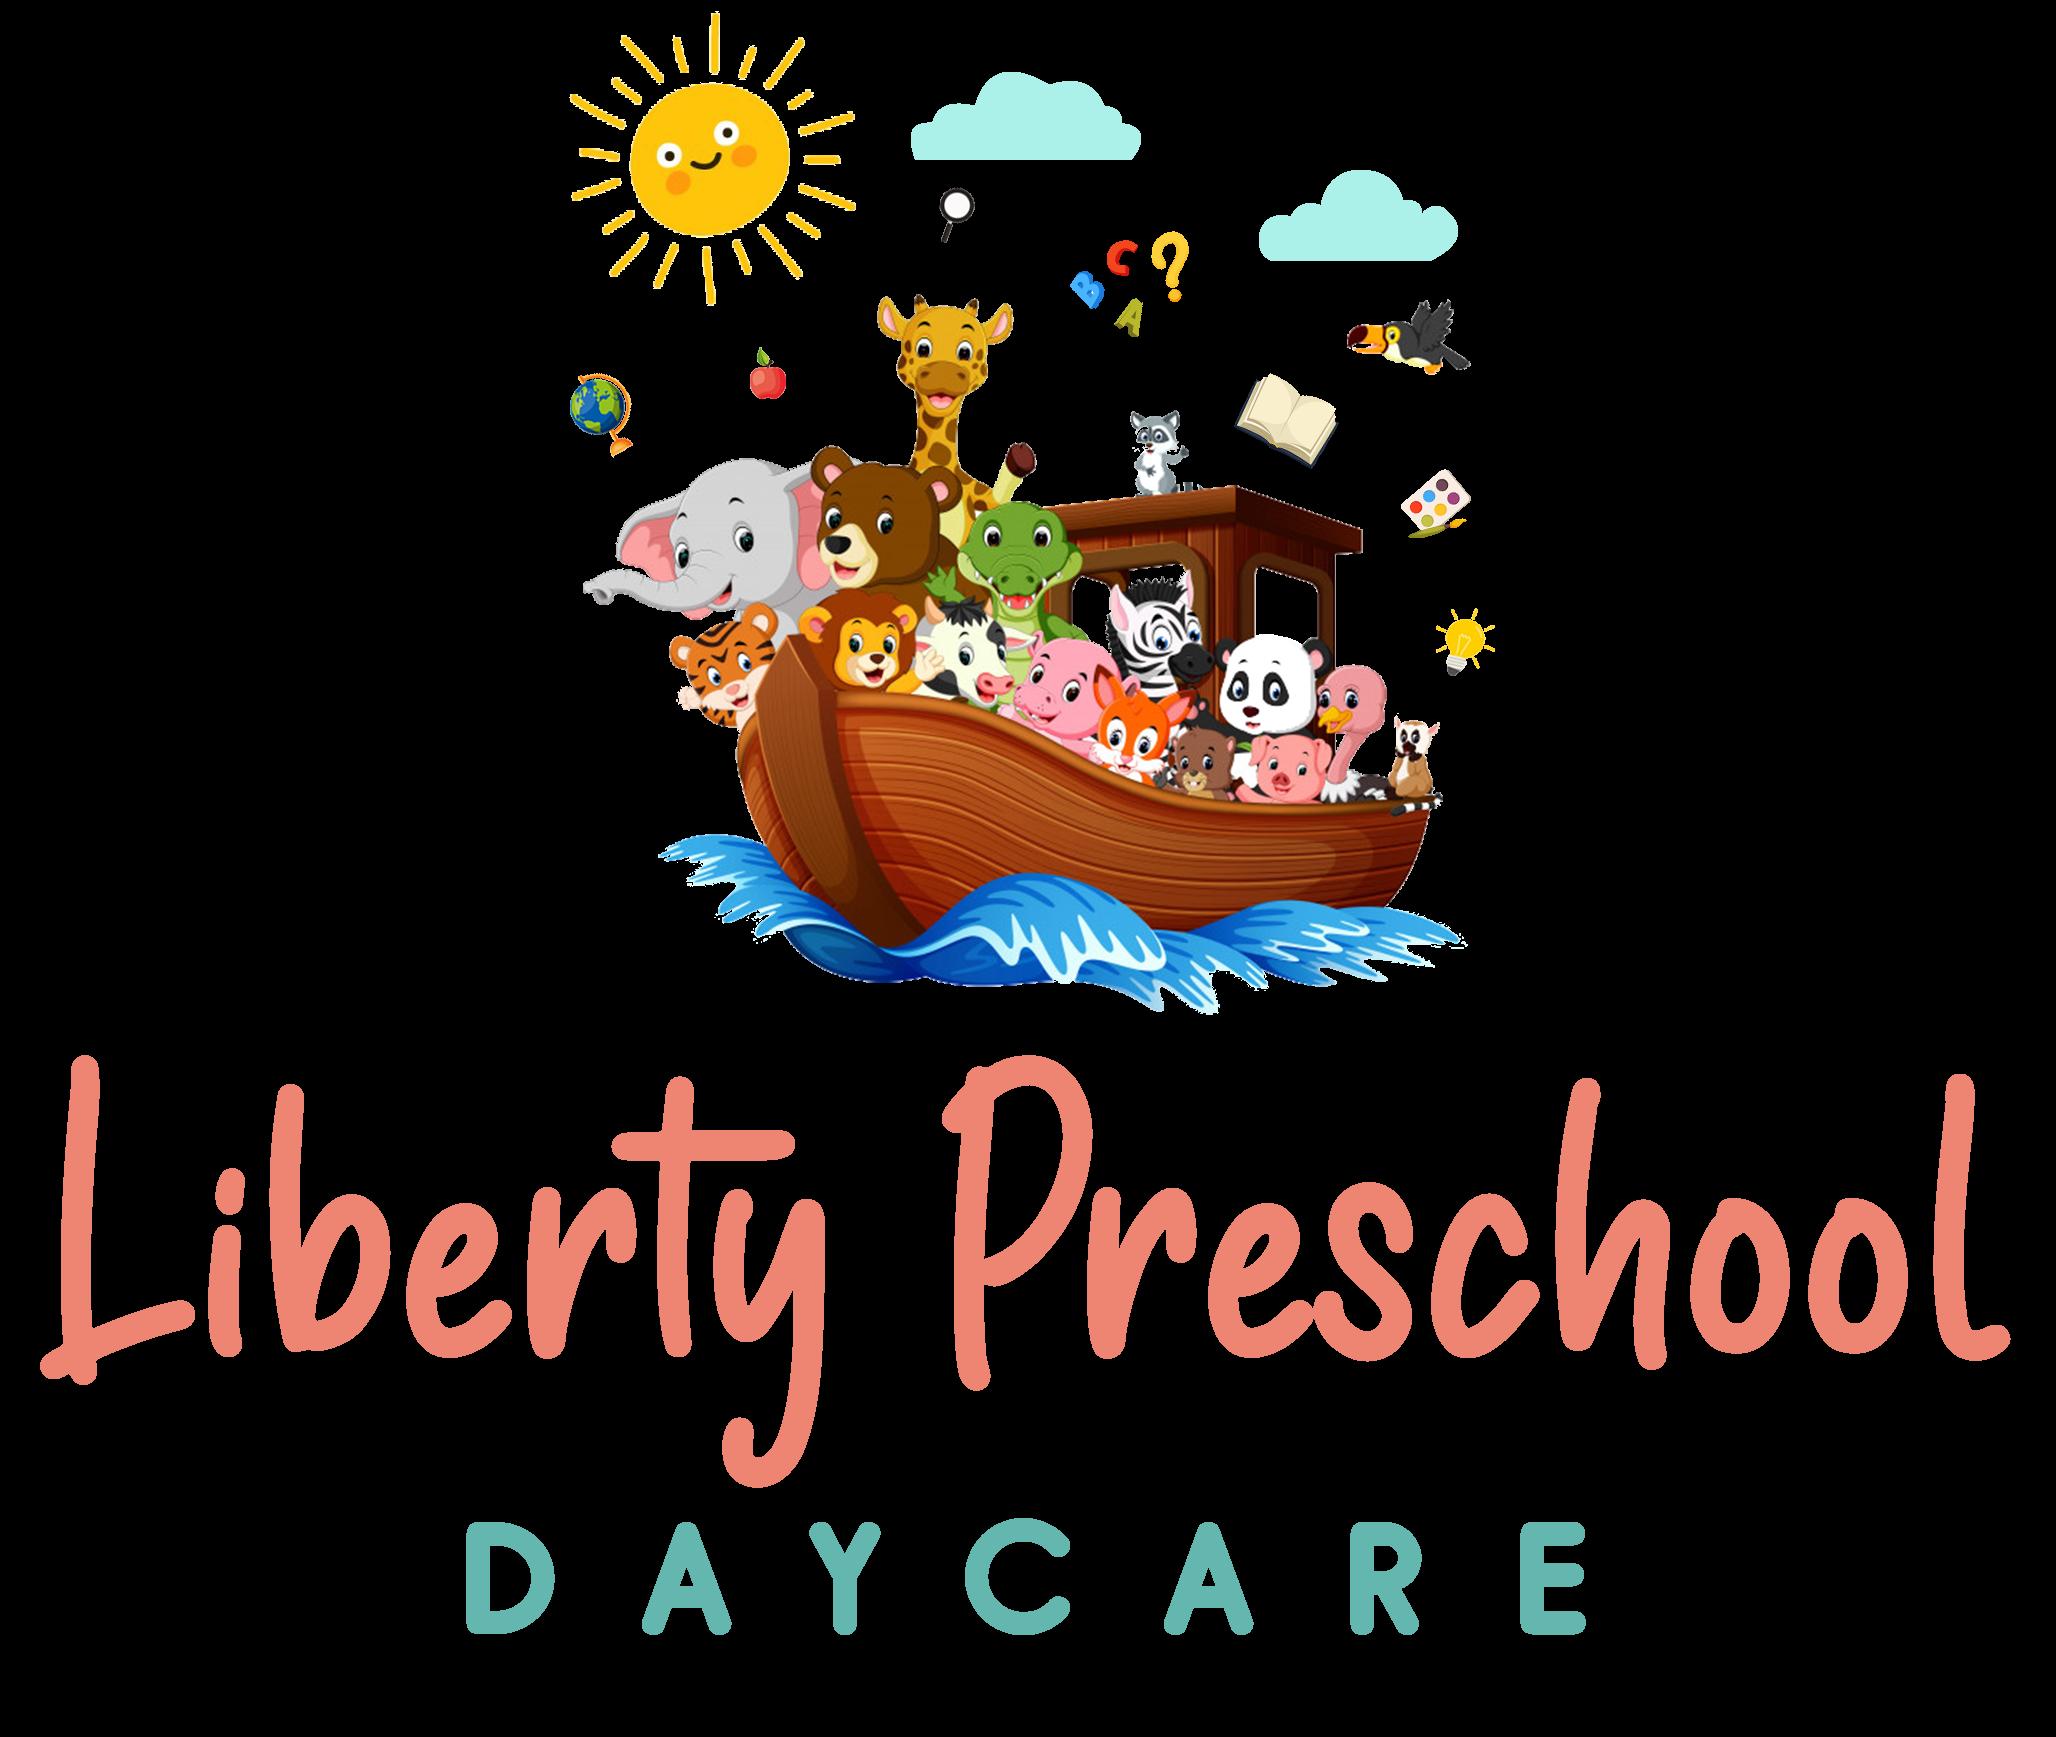 Liberty Preschool Daycare